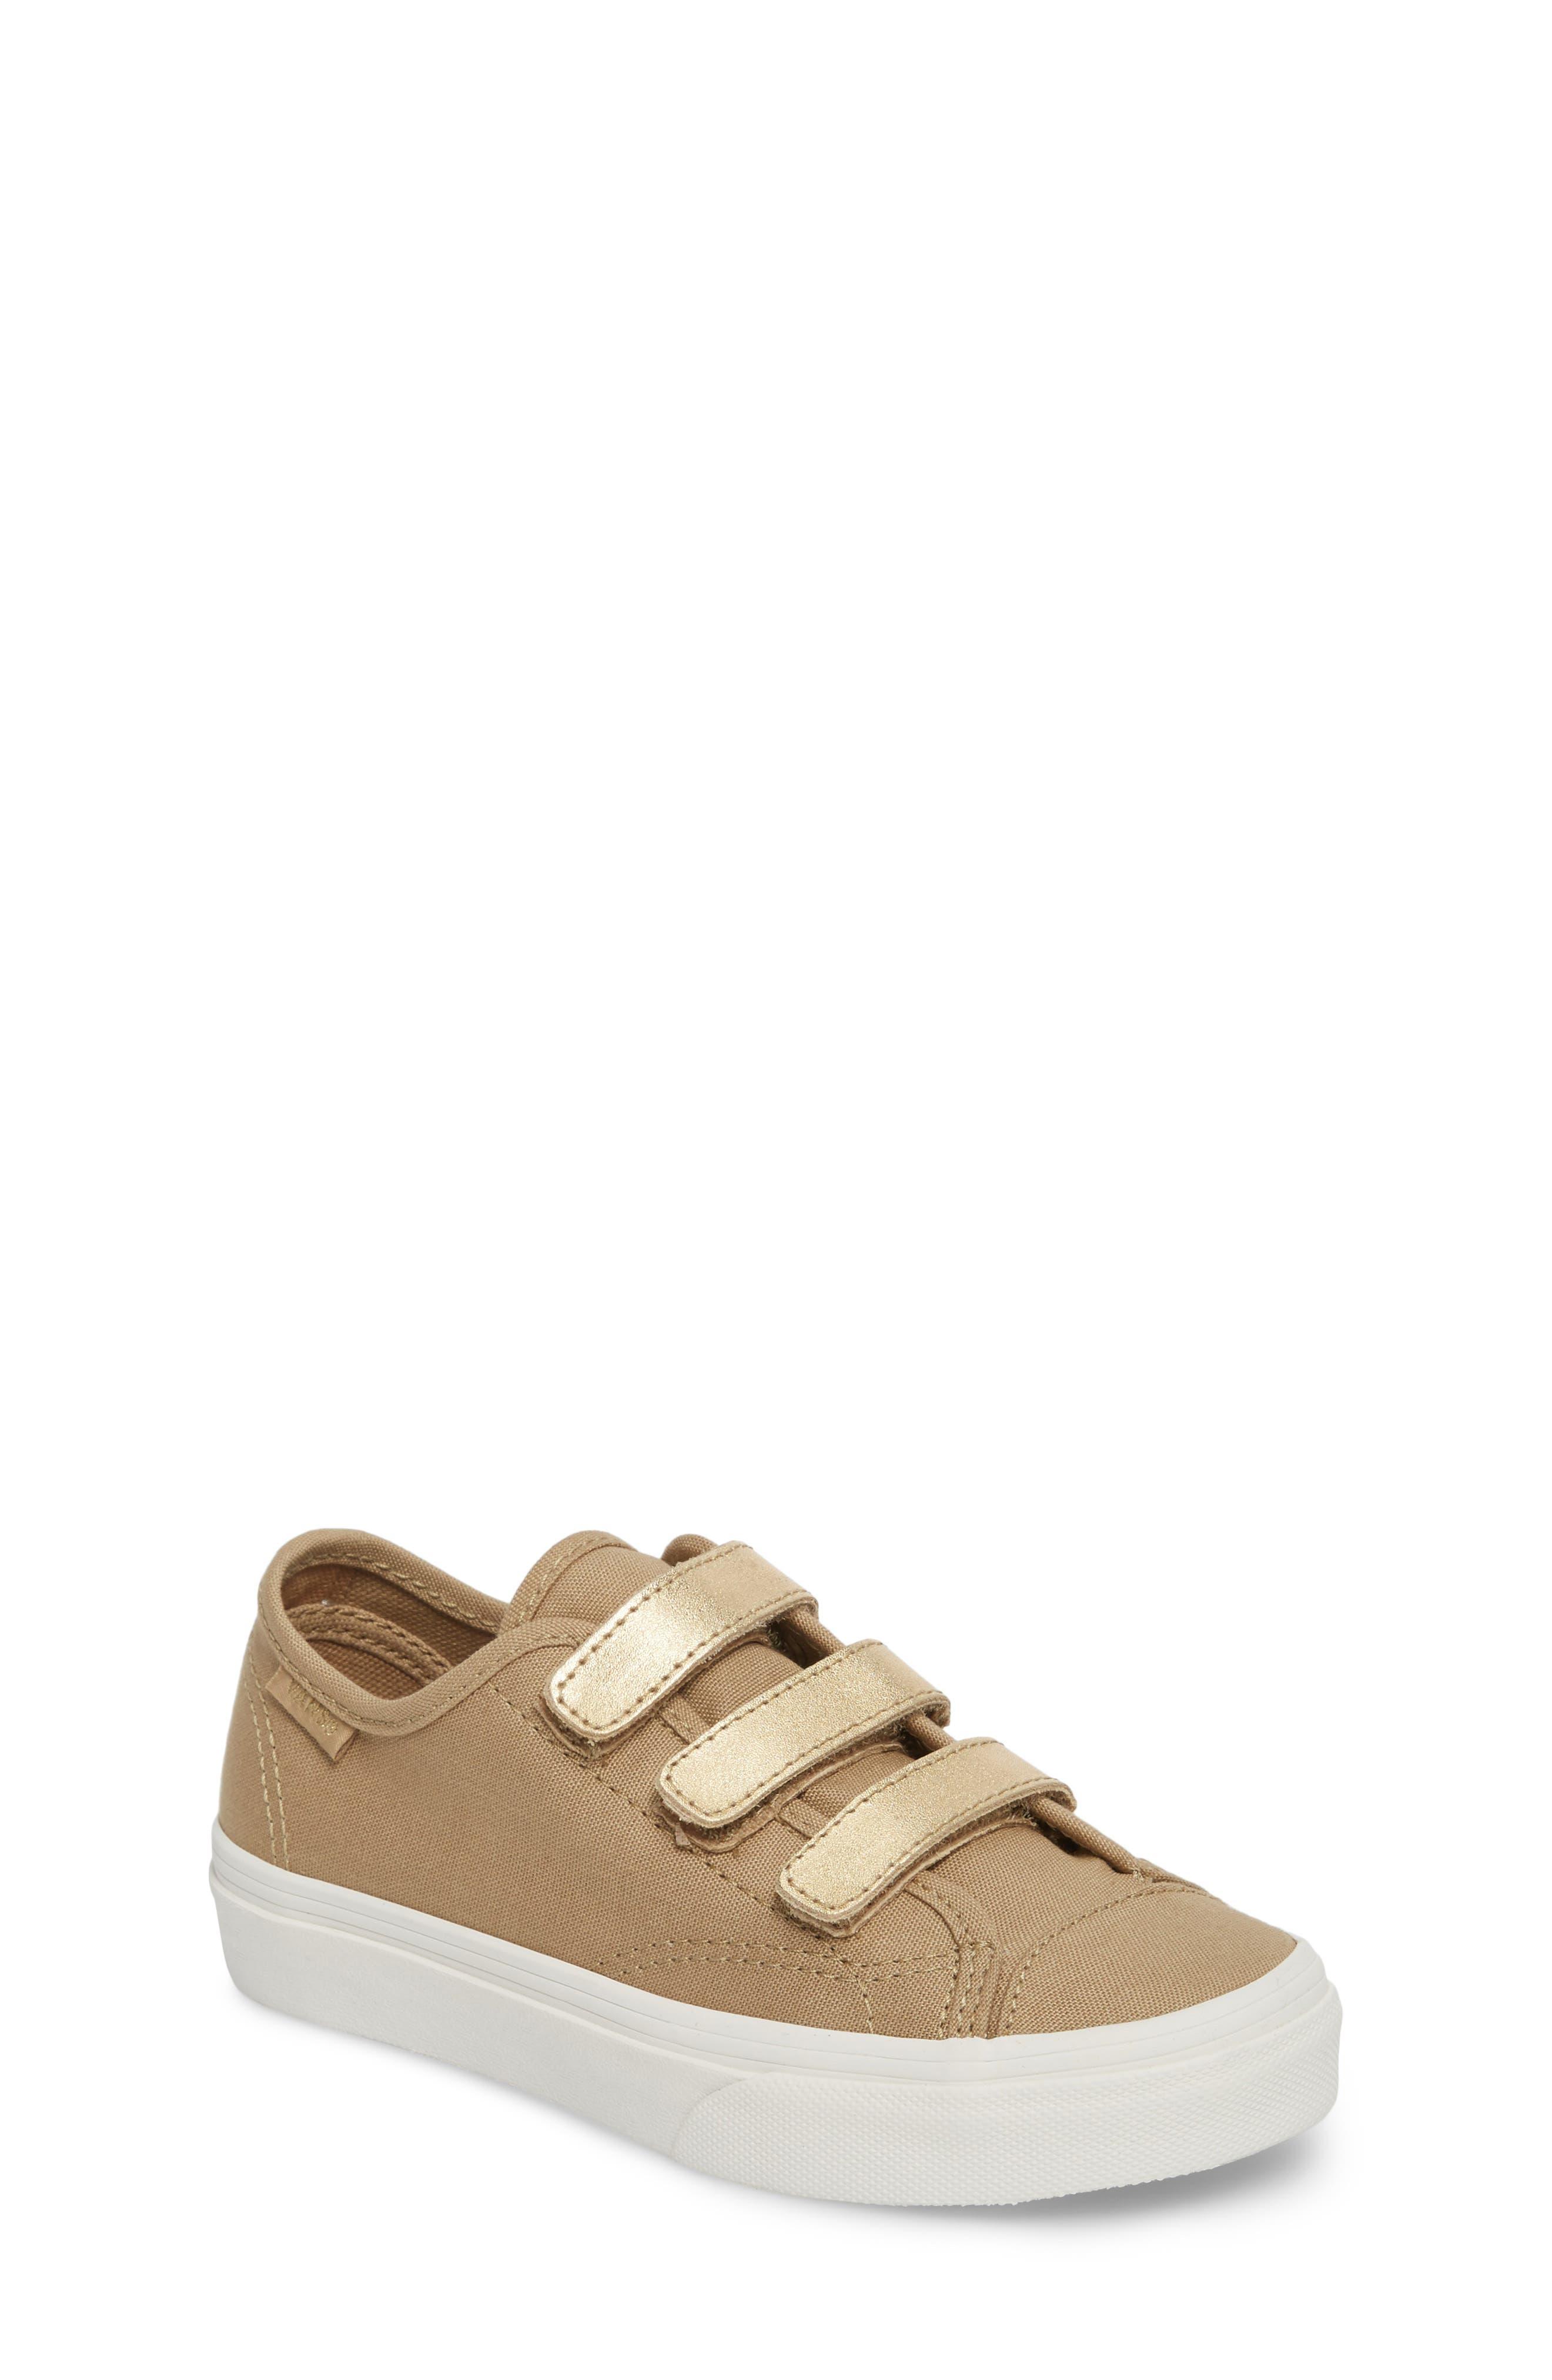 Style 23V Sneaker,                         Main,                         color, Metallic/ Cornstalk